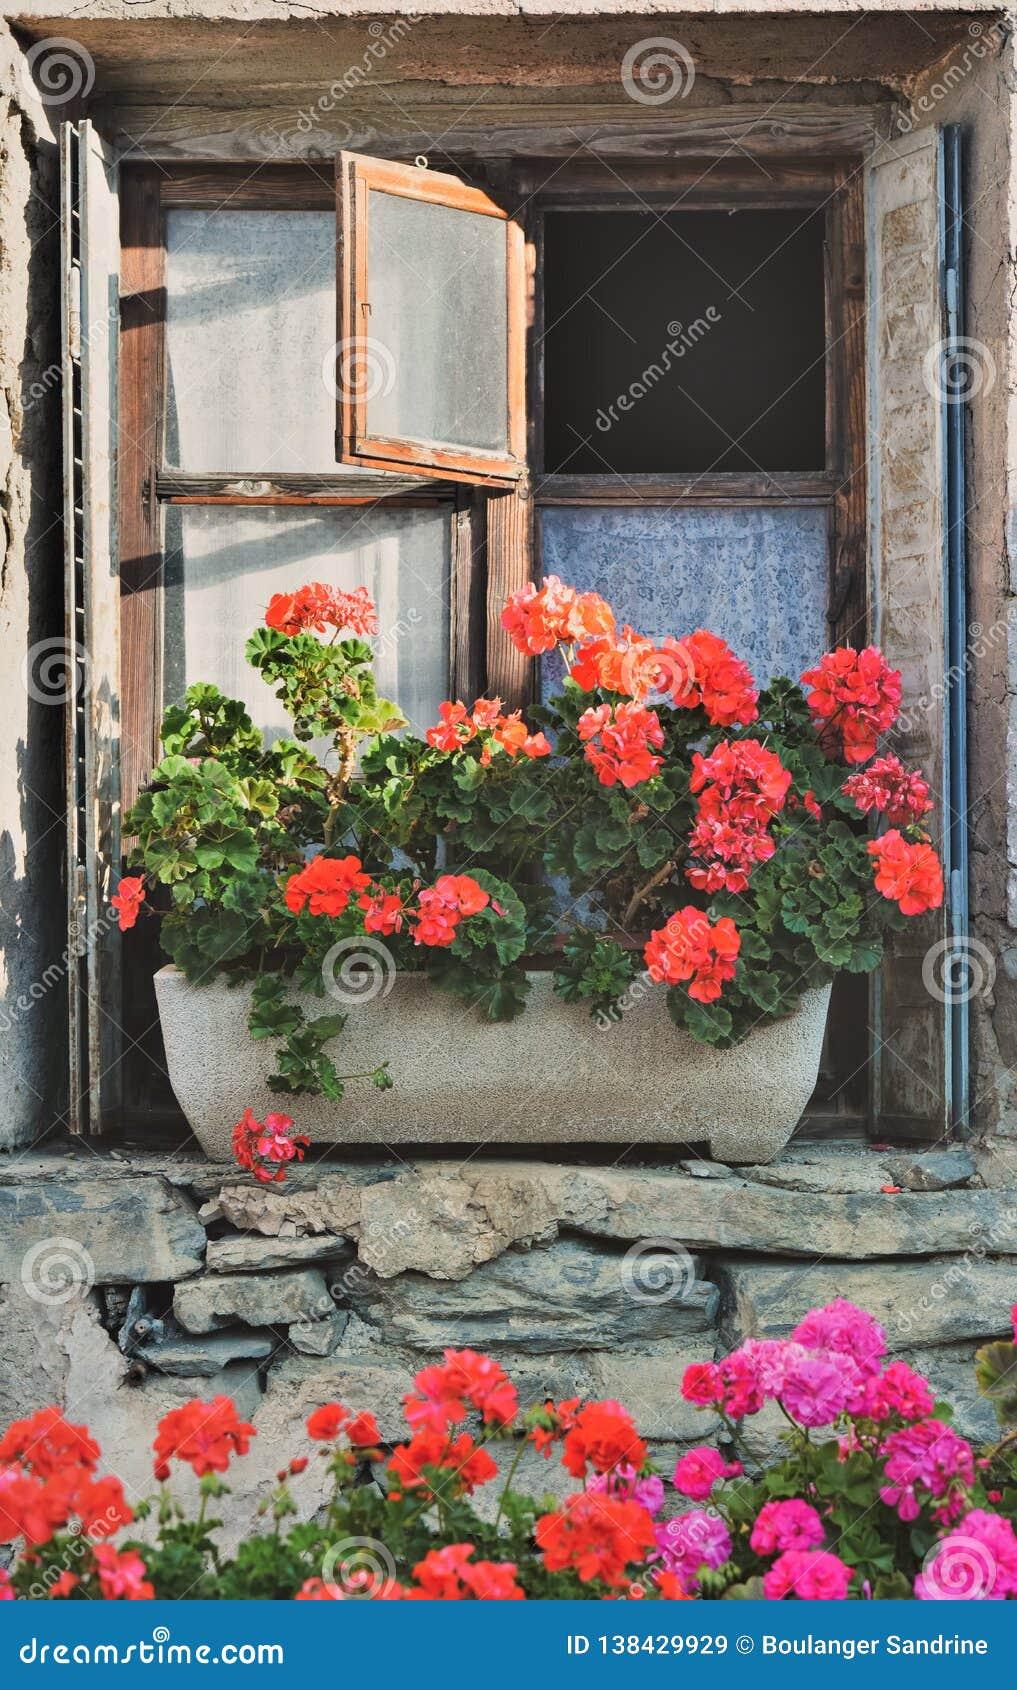 Geranium in flowerpot put on a window